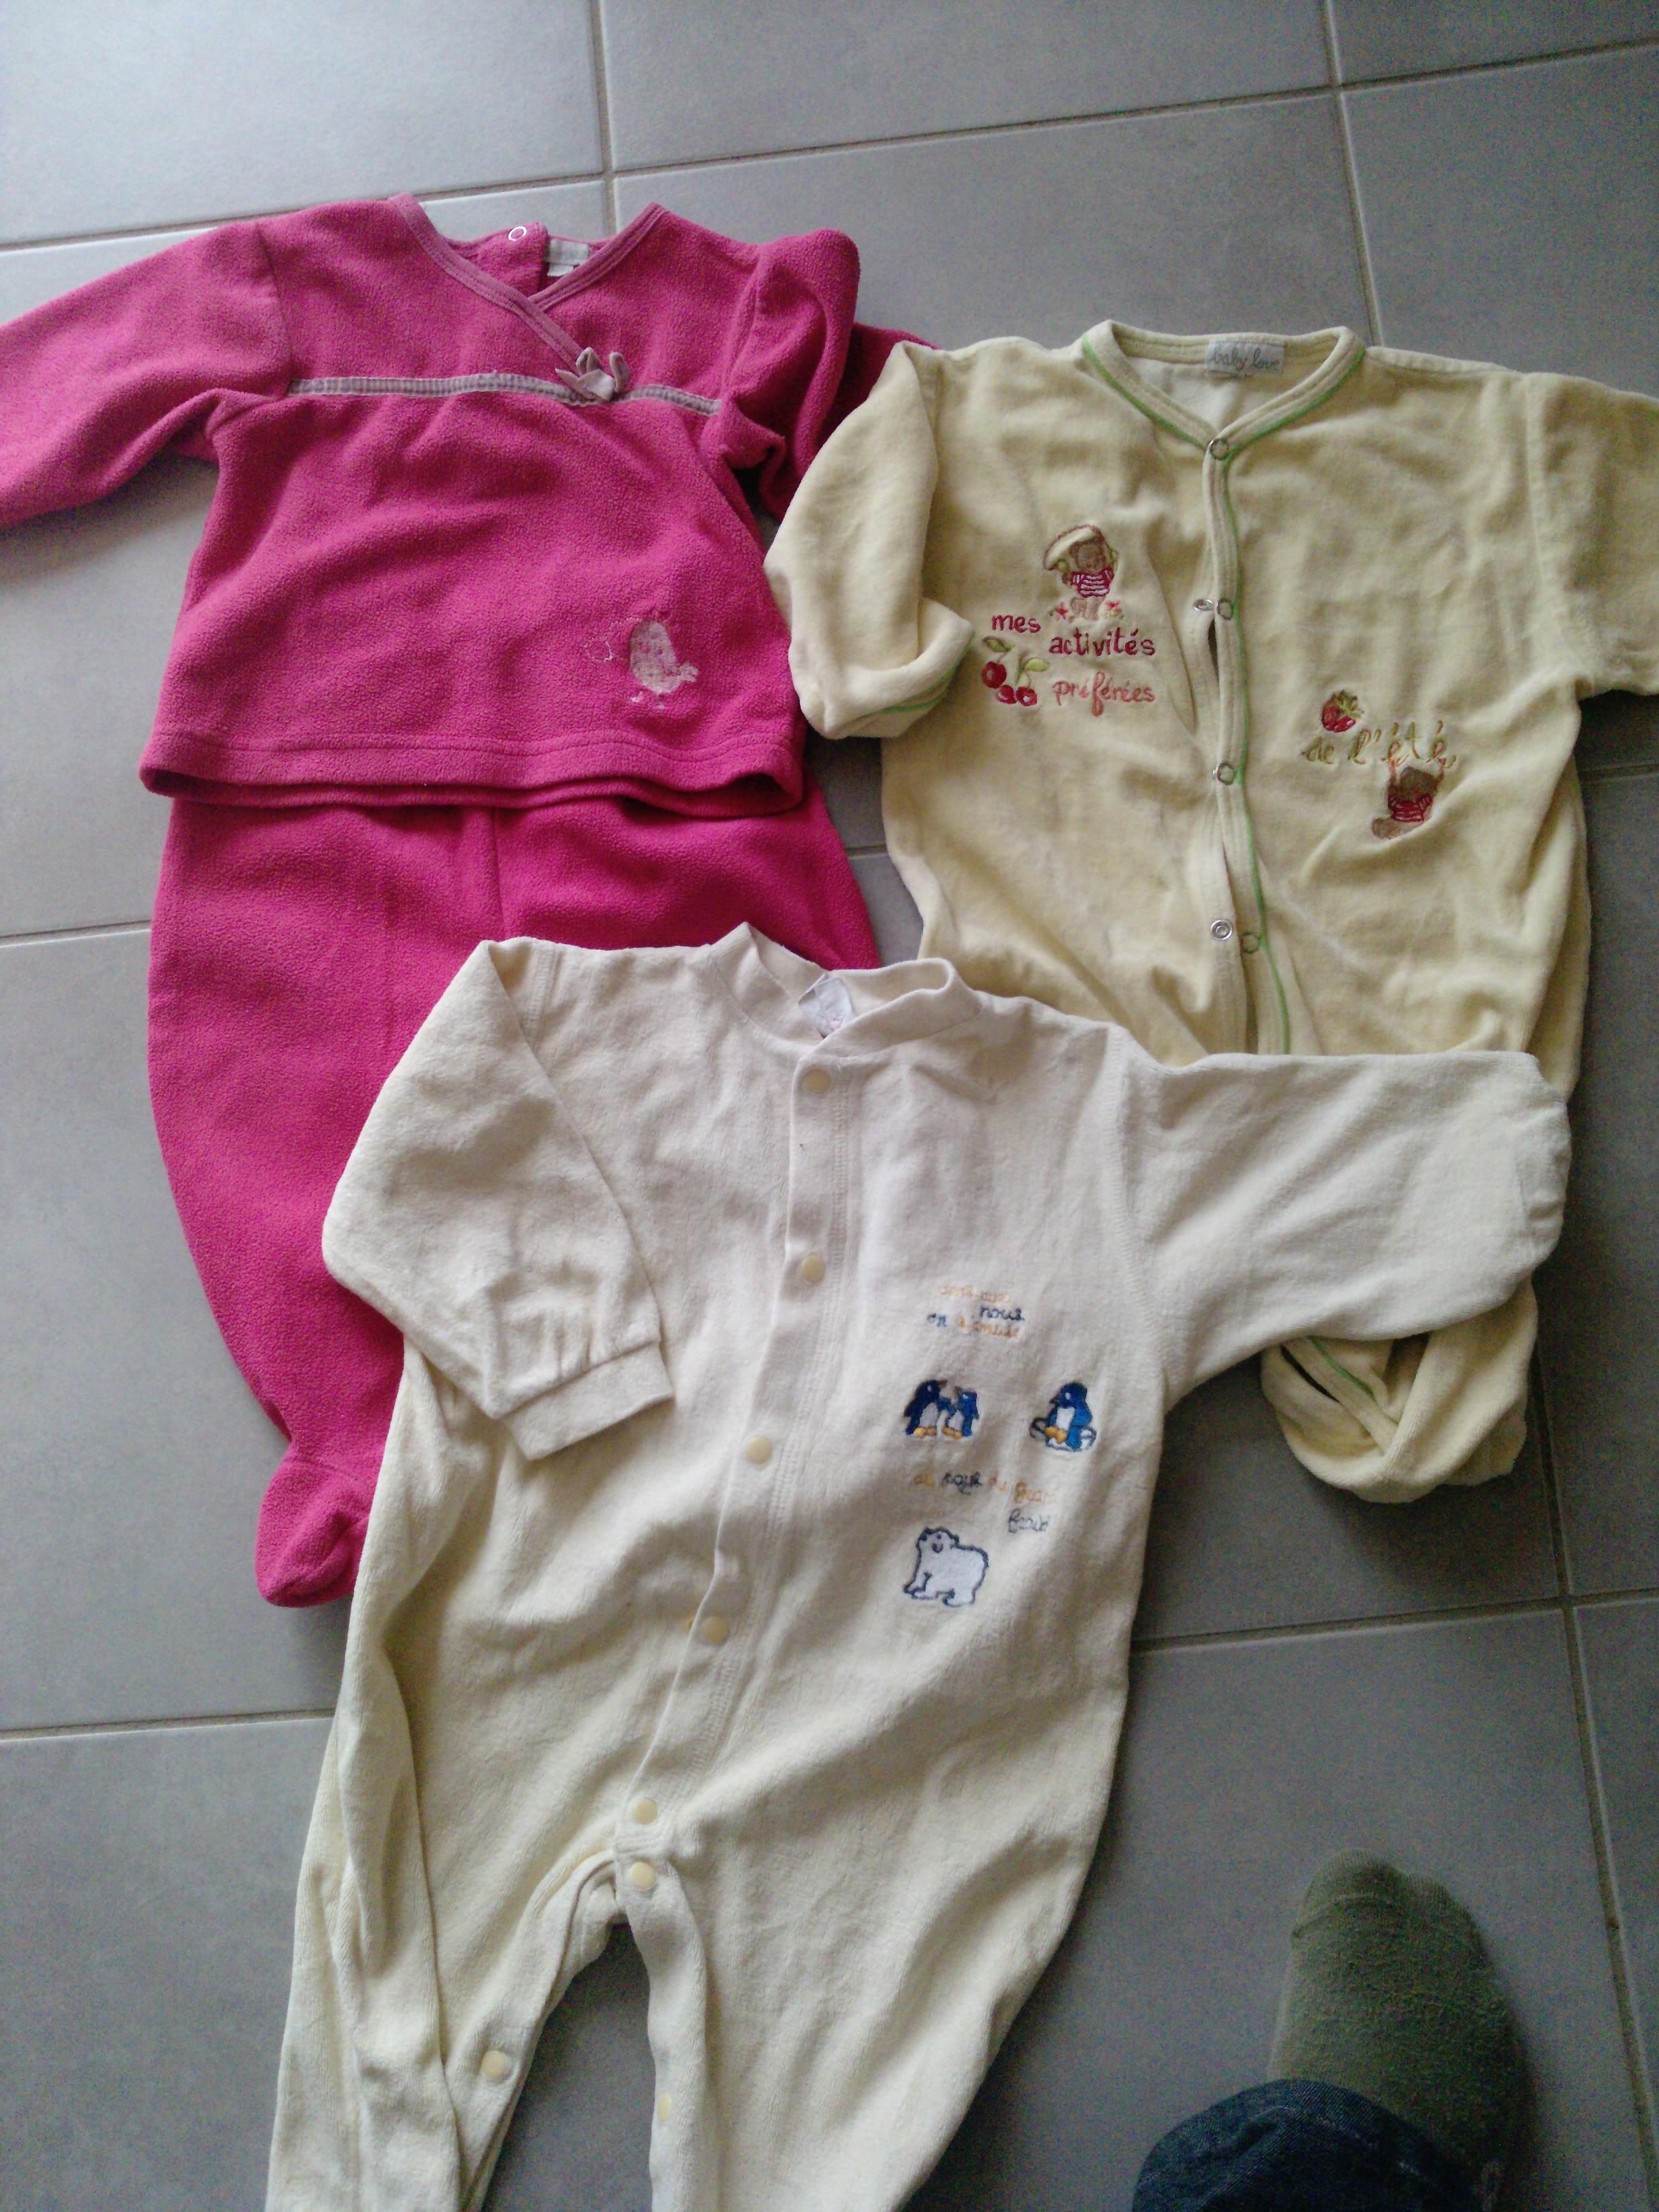 pyjamasfille12m.jpg